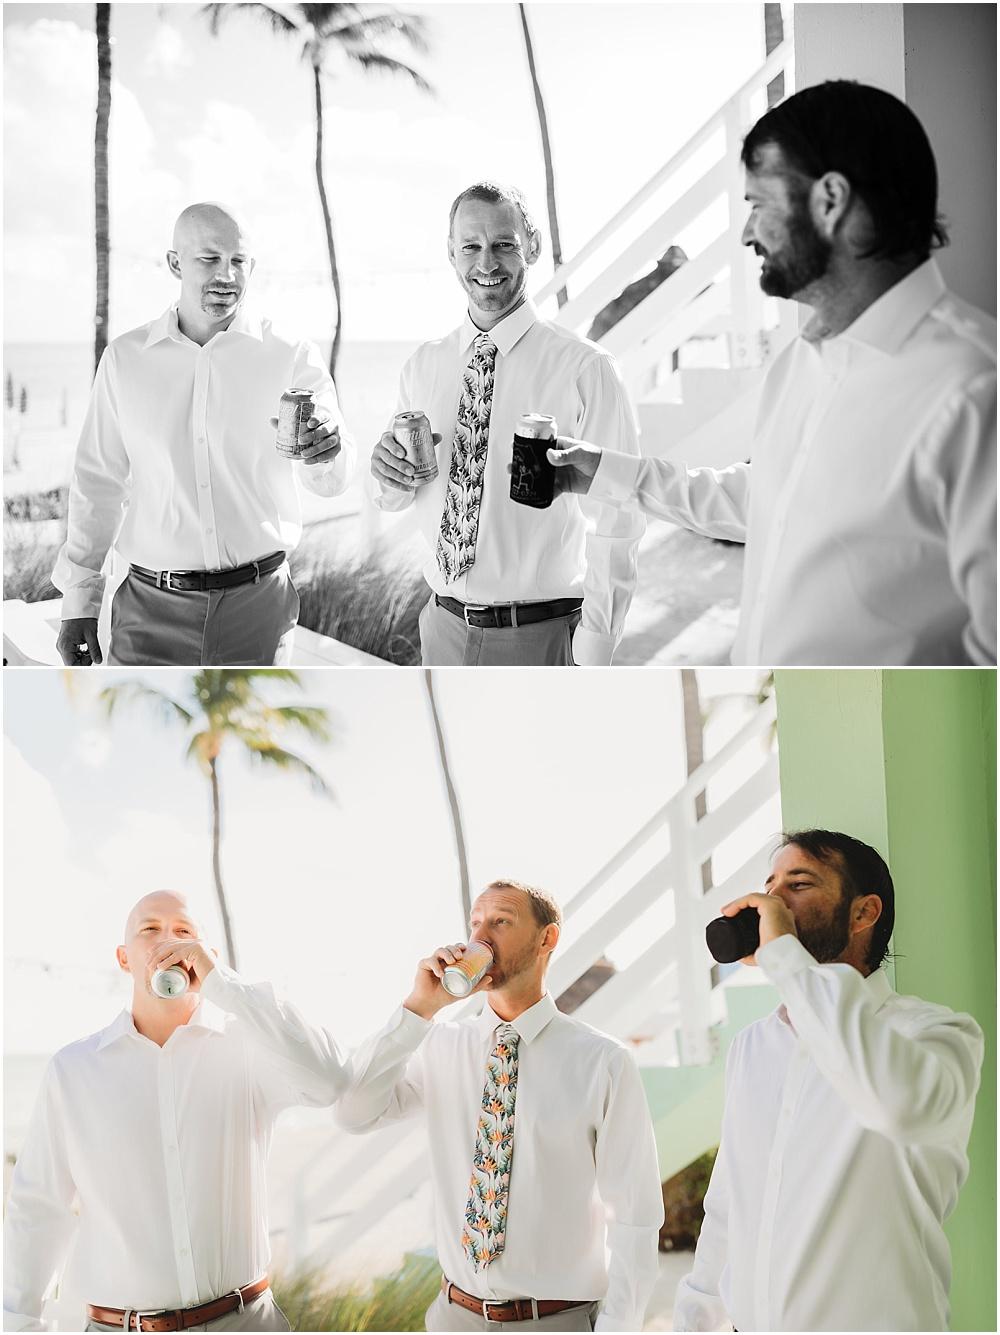 Groomsmen wedding party